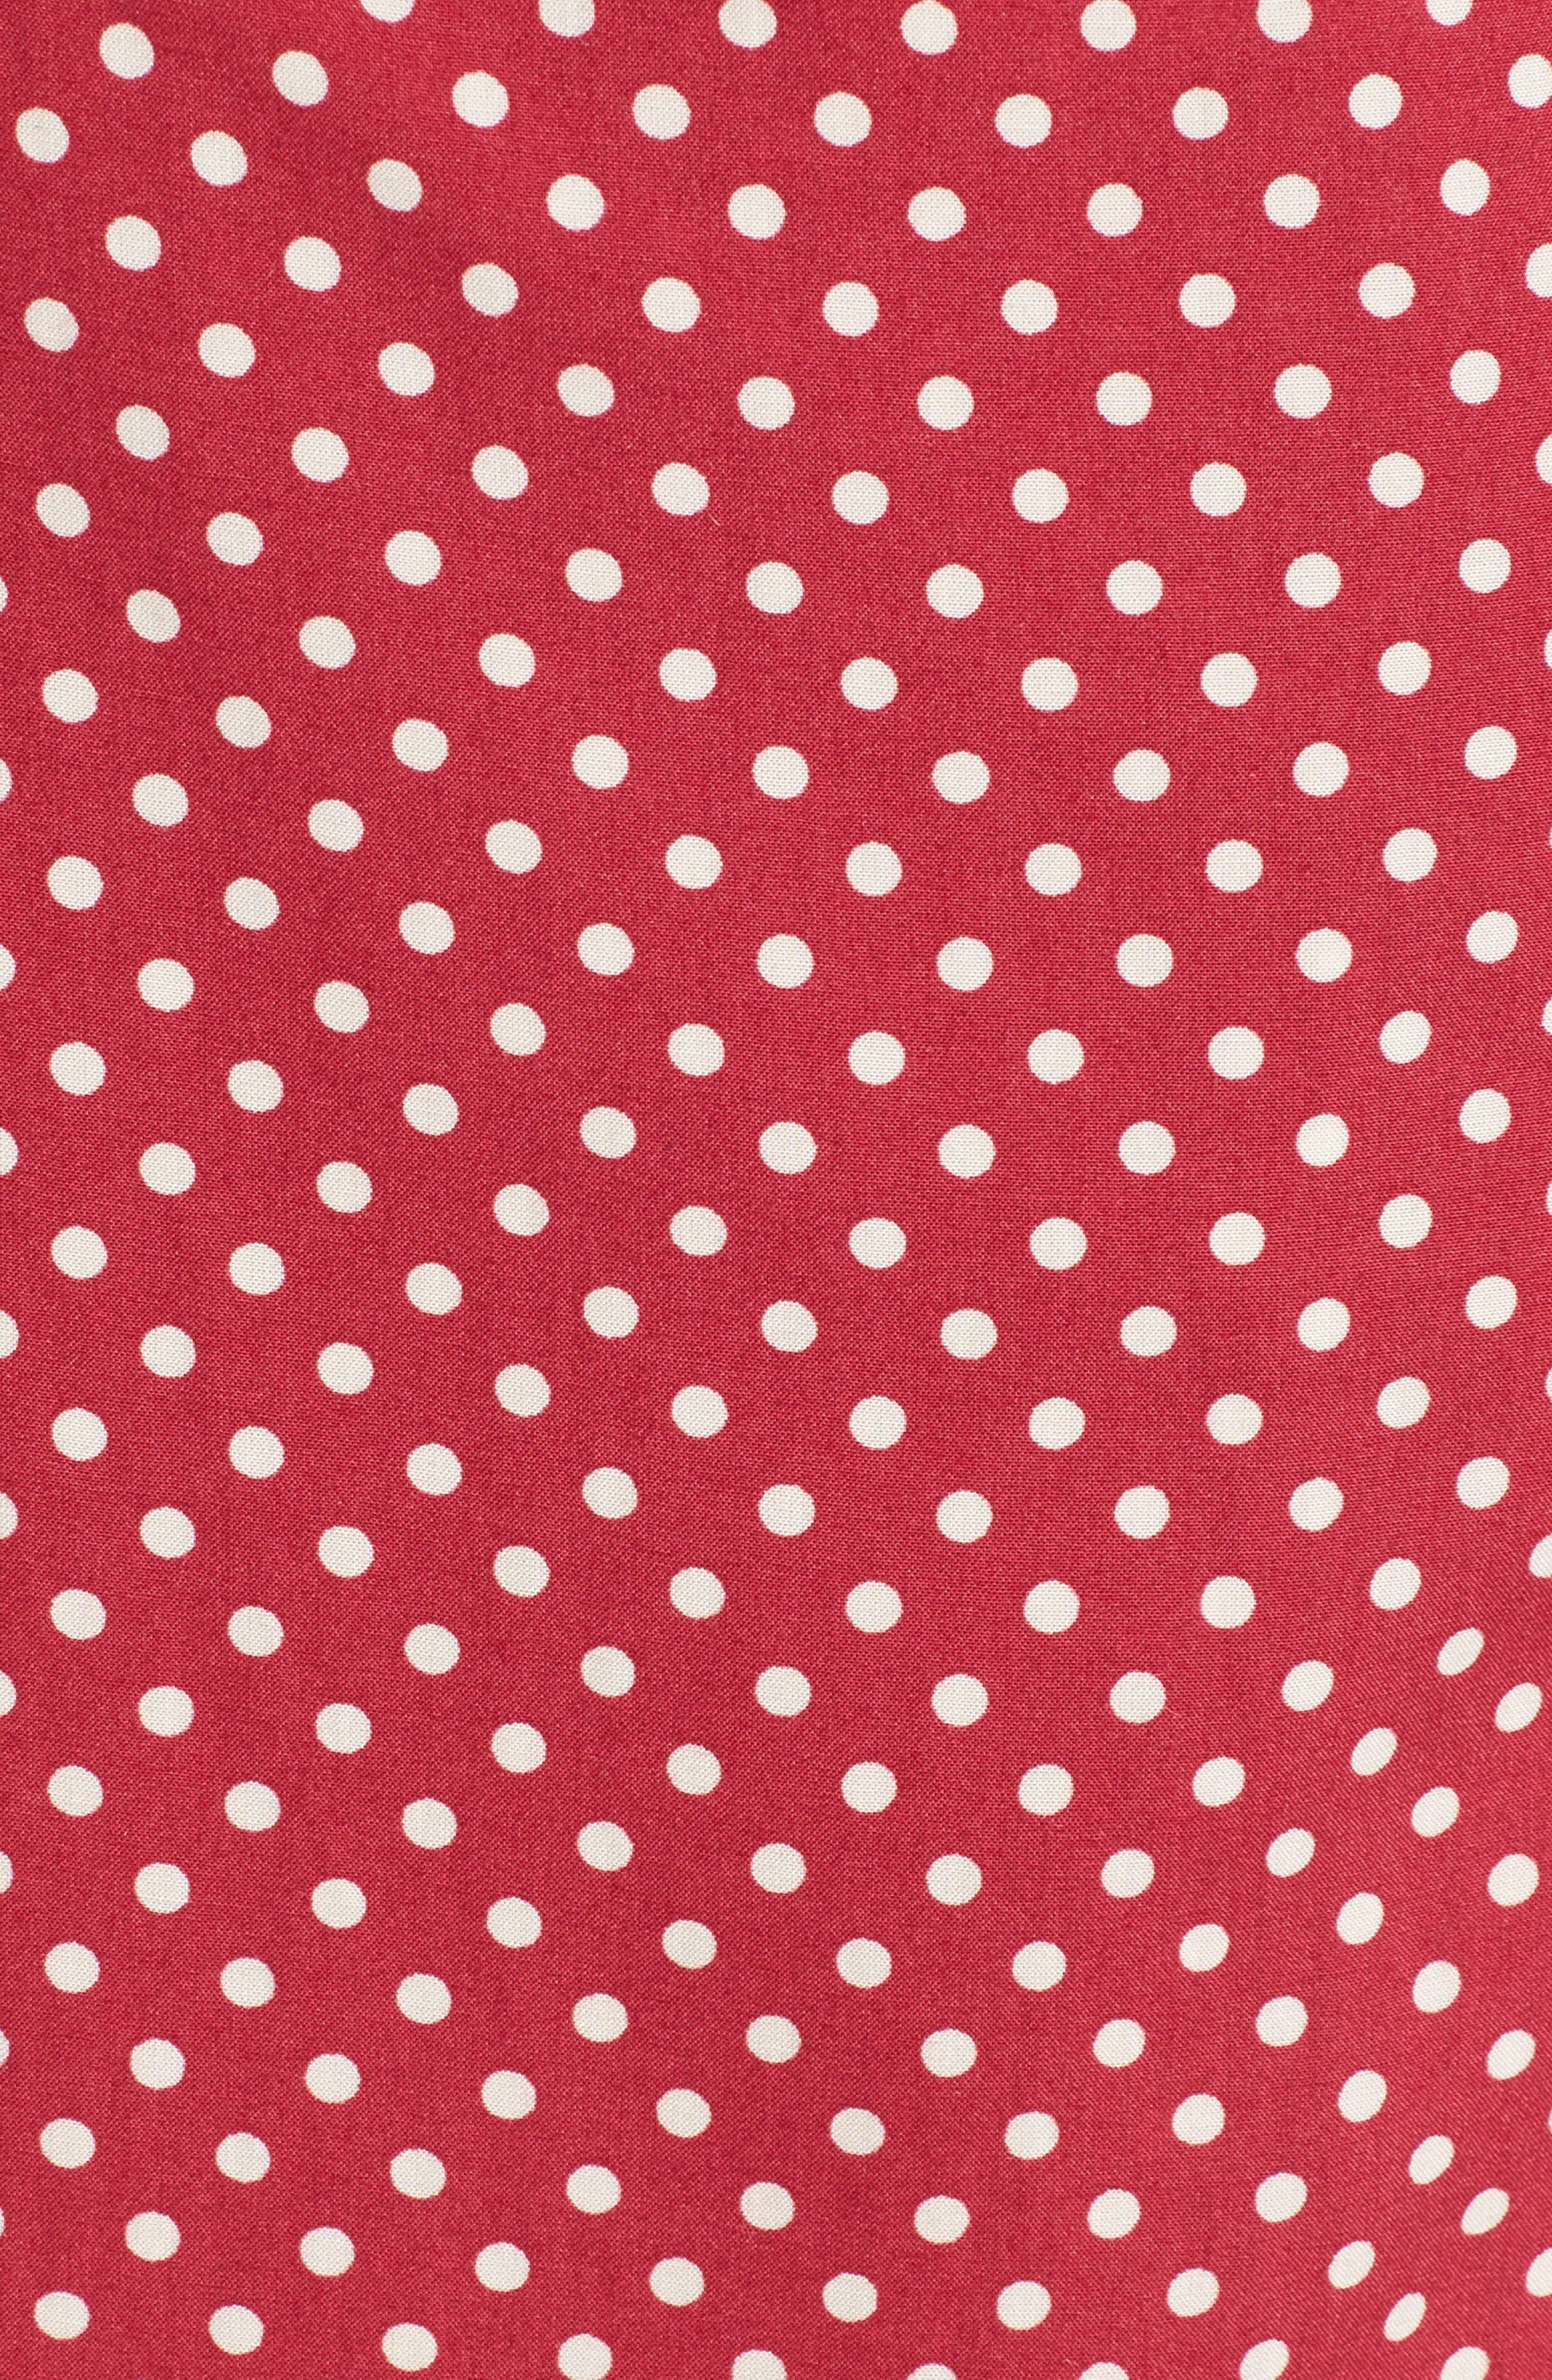 Fearless Polka Dot Wrap Dress,                             Alternate thumbnail 6, color,                             Multi Red